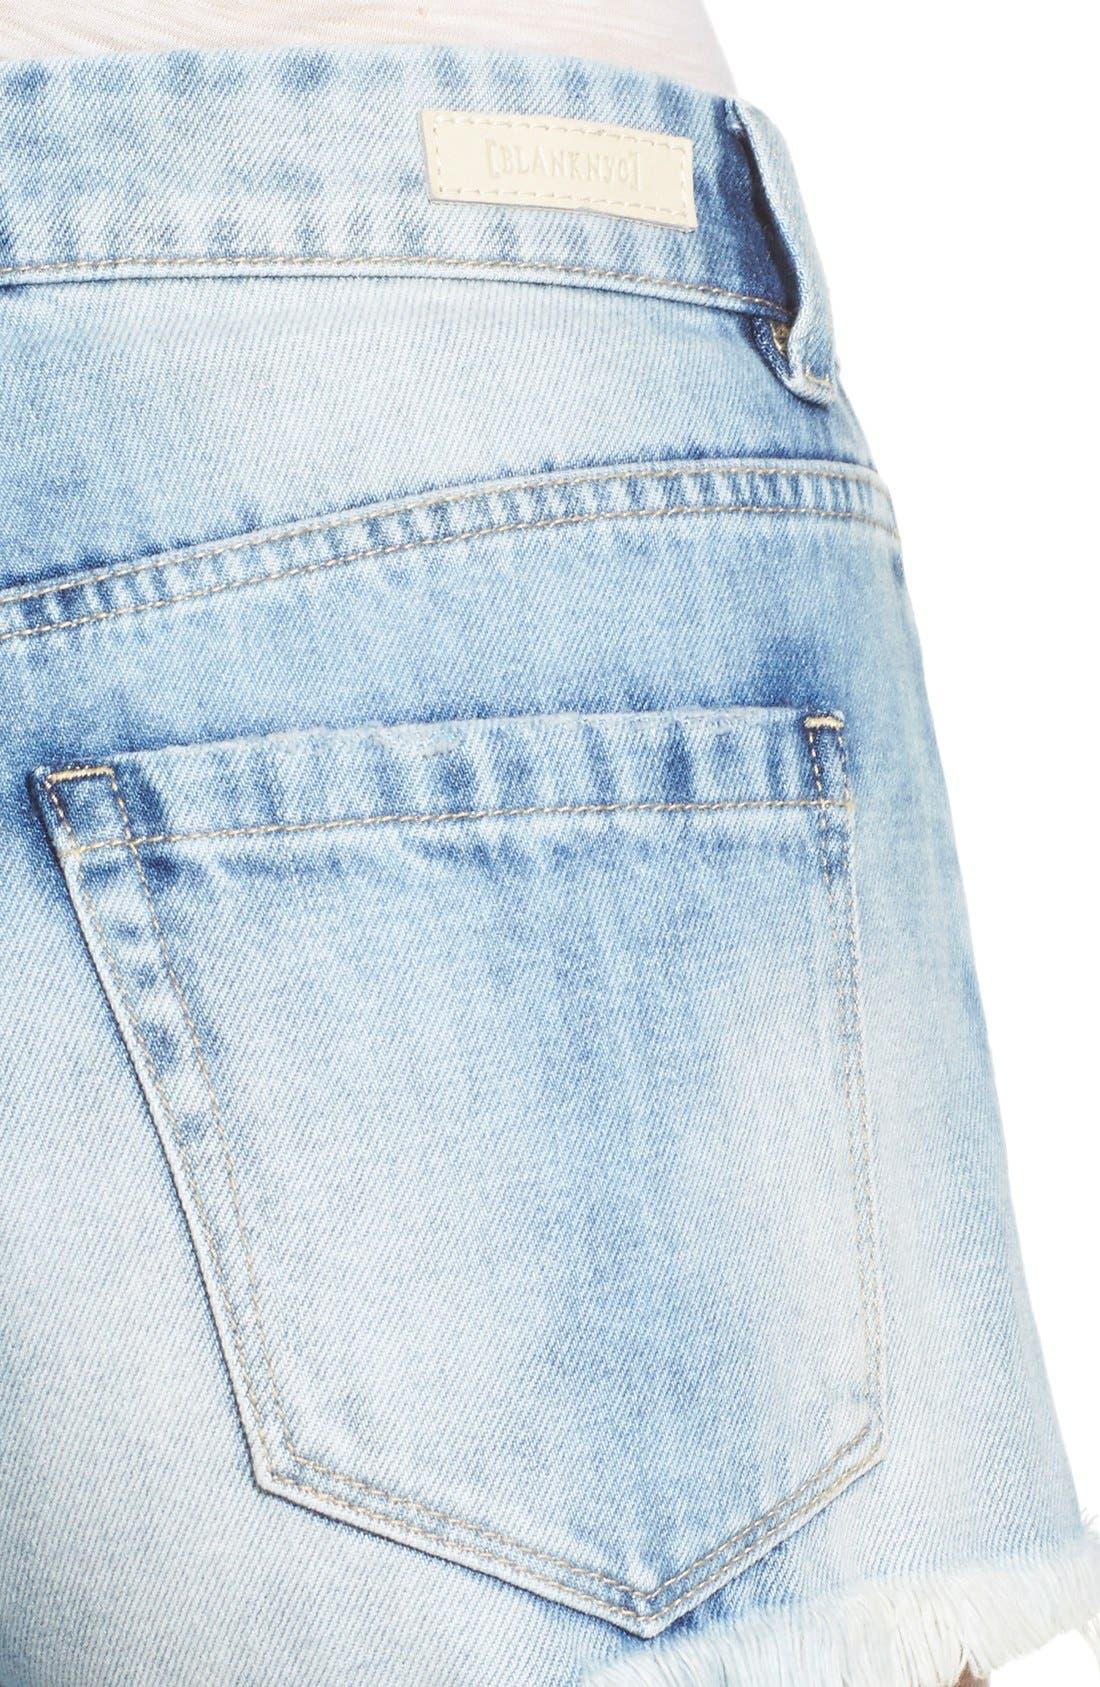 Alternate Image 4  - BLANKNYC Distressed Cutoff Denim Shorts (All Night Long)